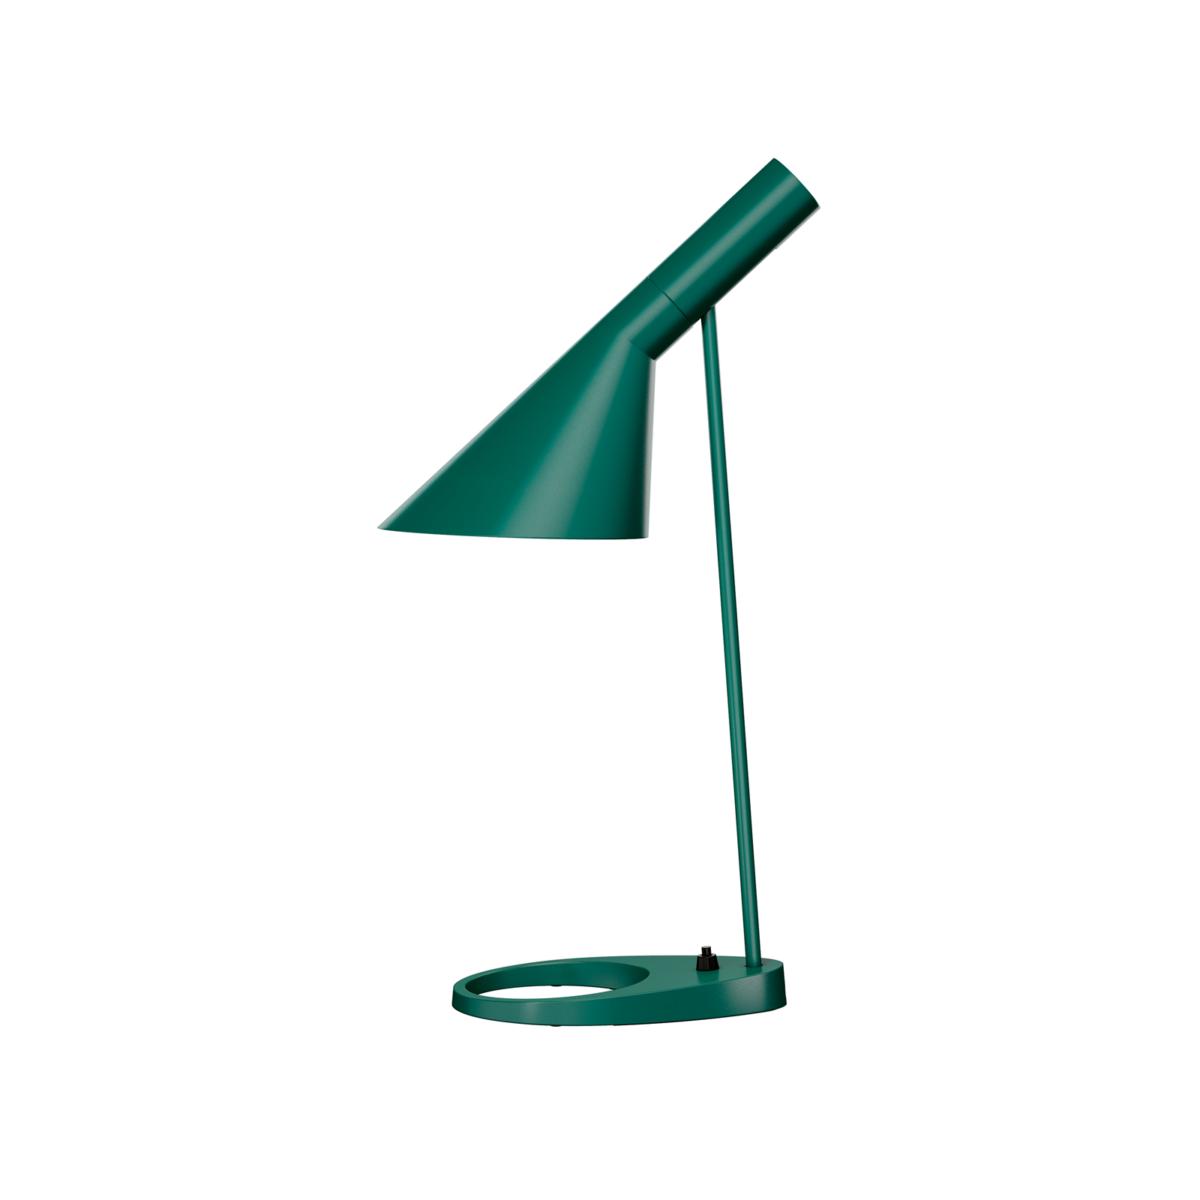 Louis Poulsen AJ Bordslampa mörkgrön Glashuset malmö